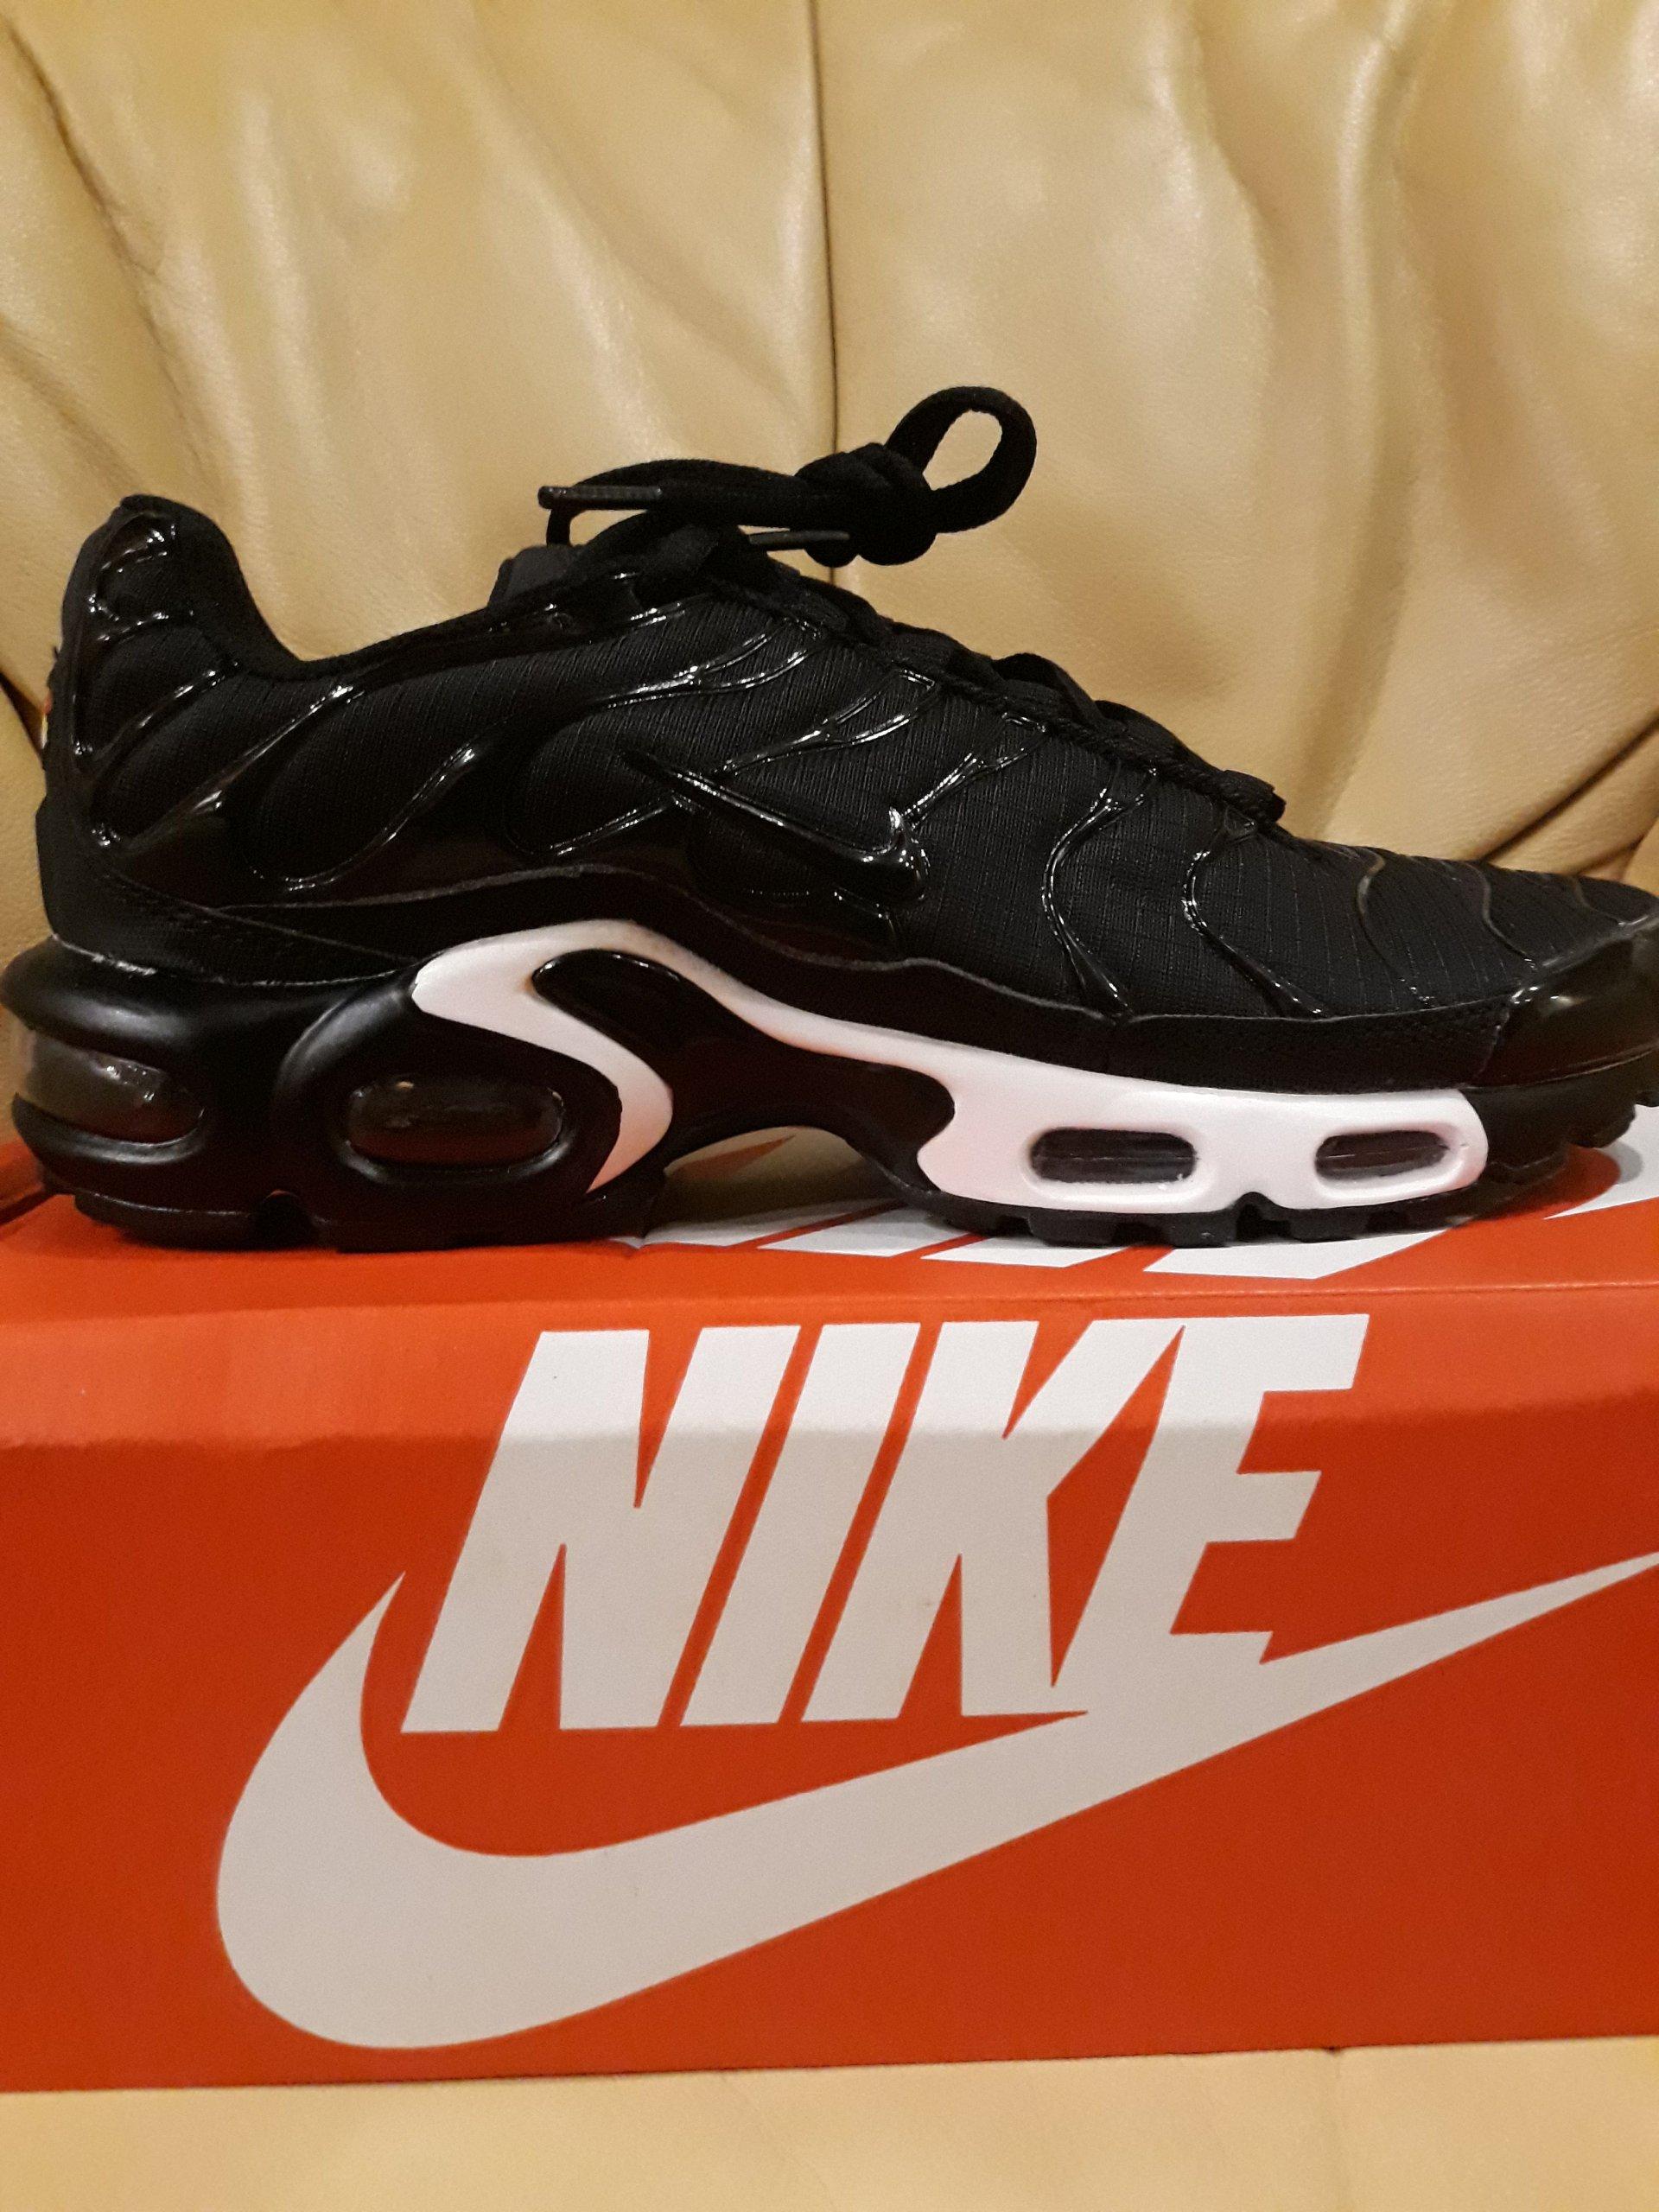 d87e2b66a8fe9 Nike Air Max Plus 604133 nowe oryginal - rozmiary - 7081782459 - oficjalne  archiwum allegro